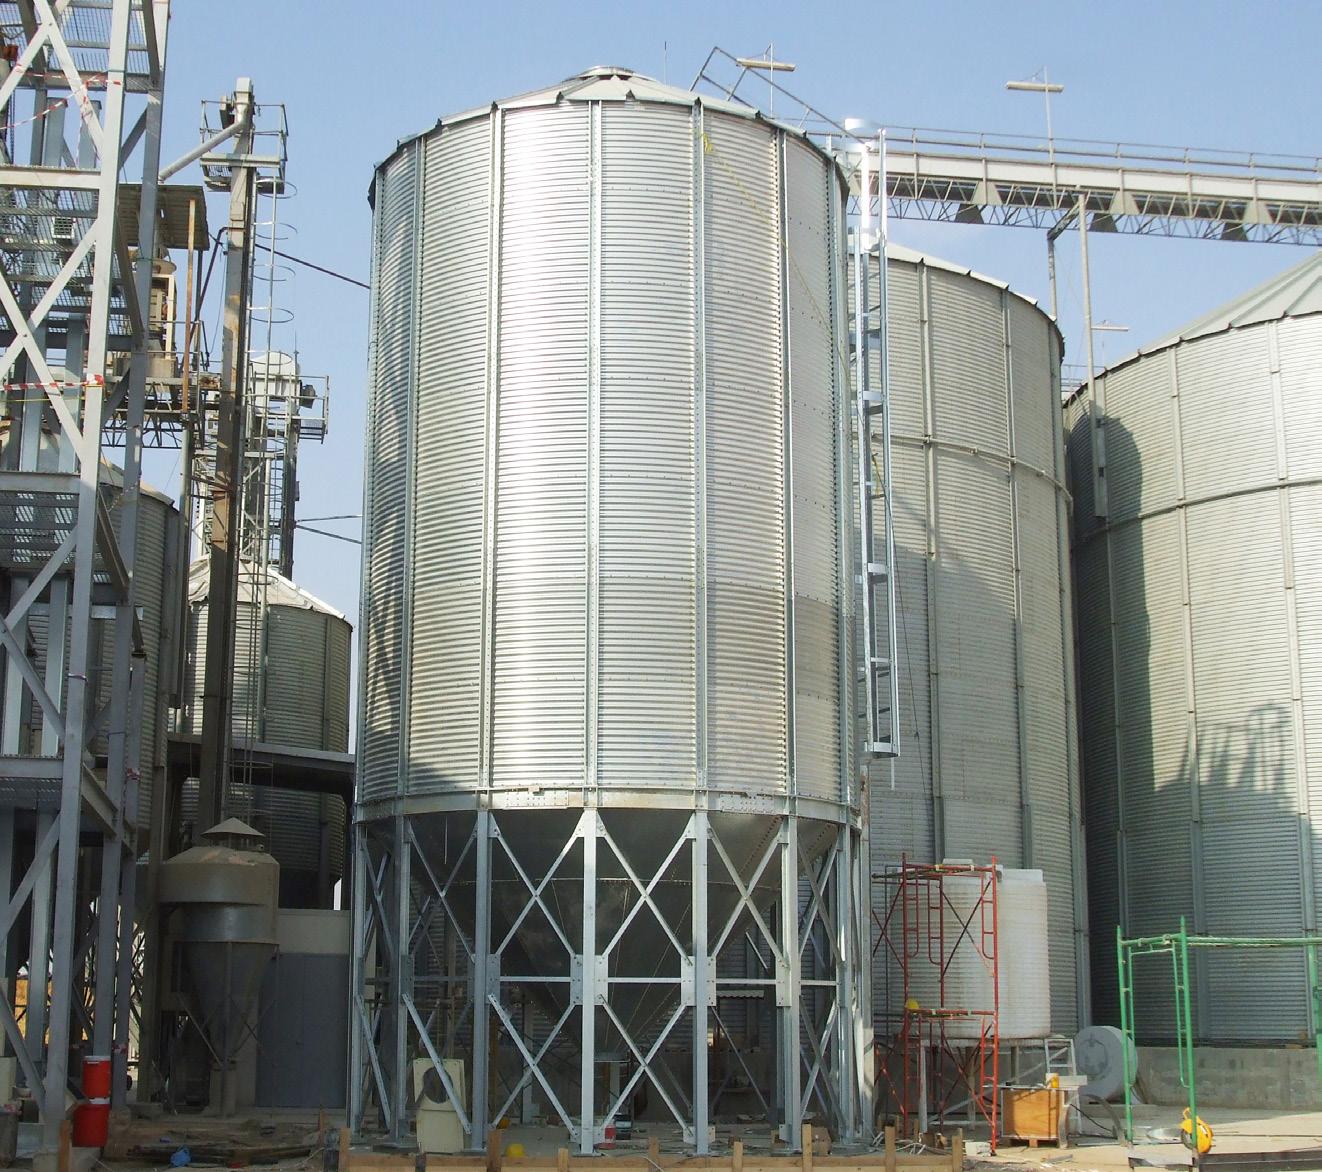 Alvan Blanch Steam Flaking Factory Al Safi Saudi Arabia Page 1 Image 0001